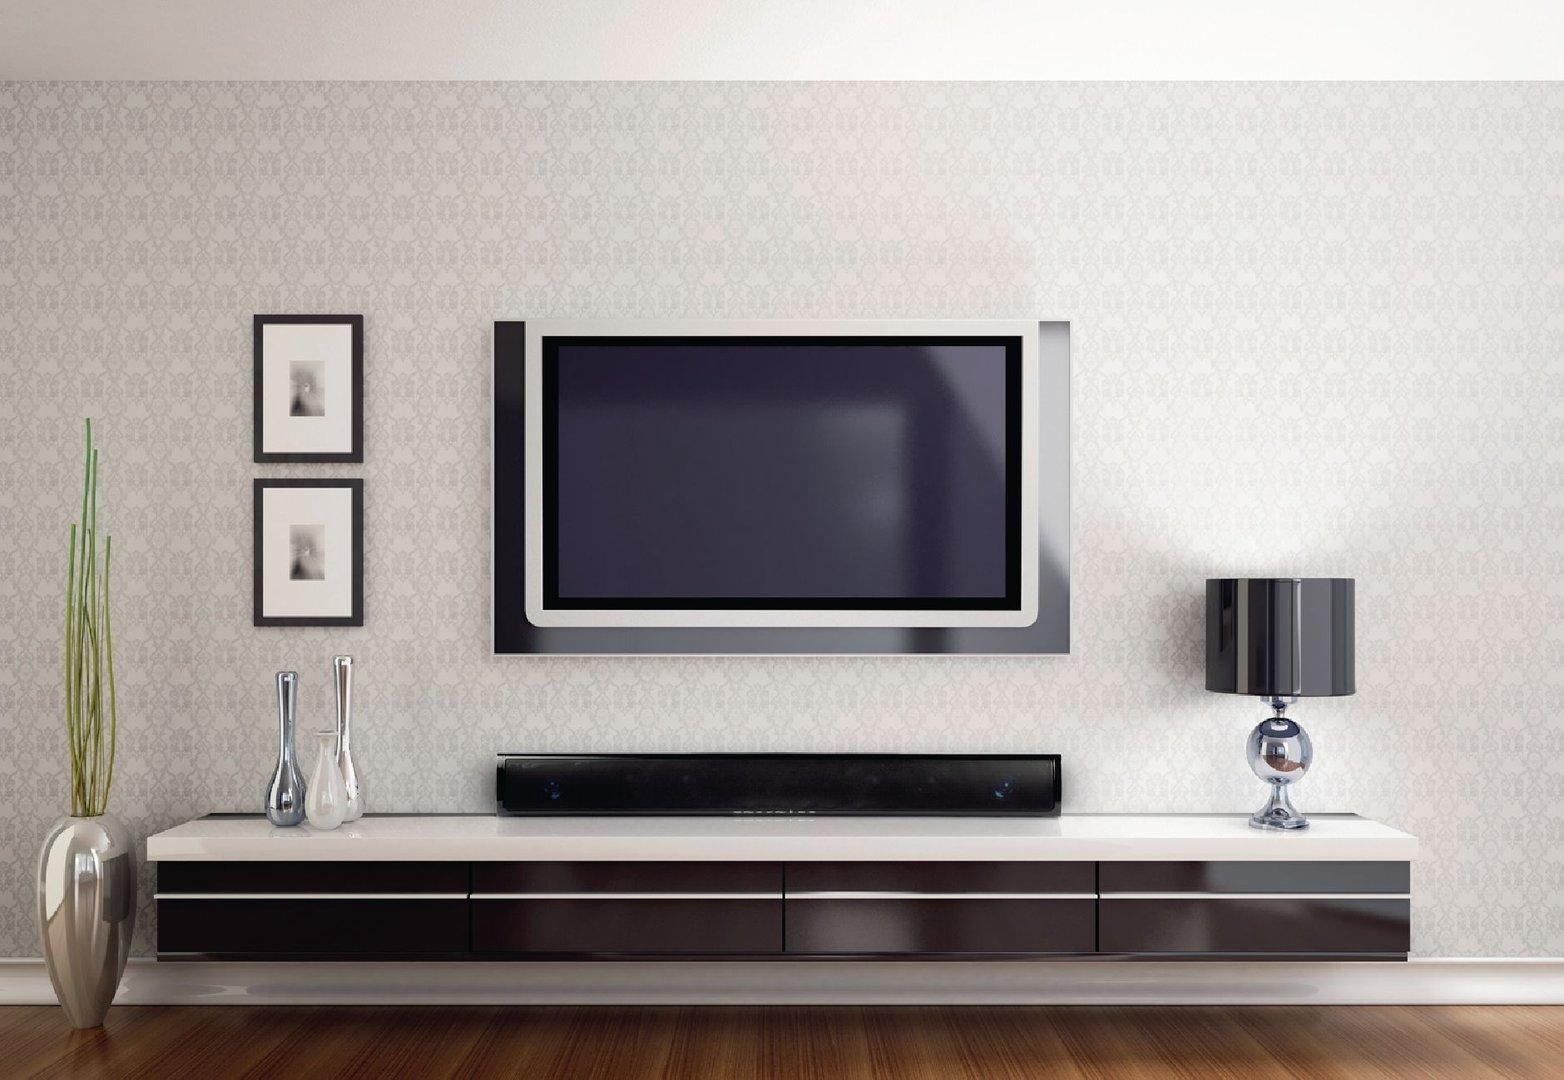 barre de son noir piano soundbar 2 1 hav sb400 300w 60w rms. Black Bedroom Furniture Sets. Home Design Ideas